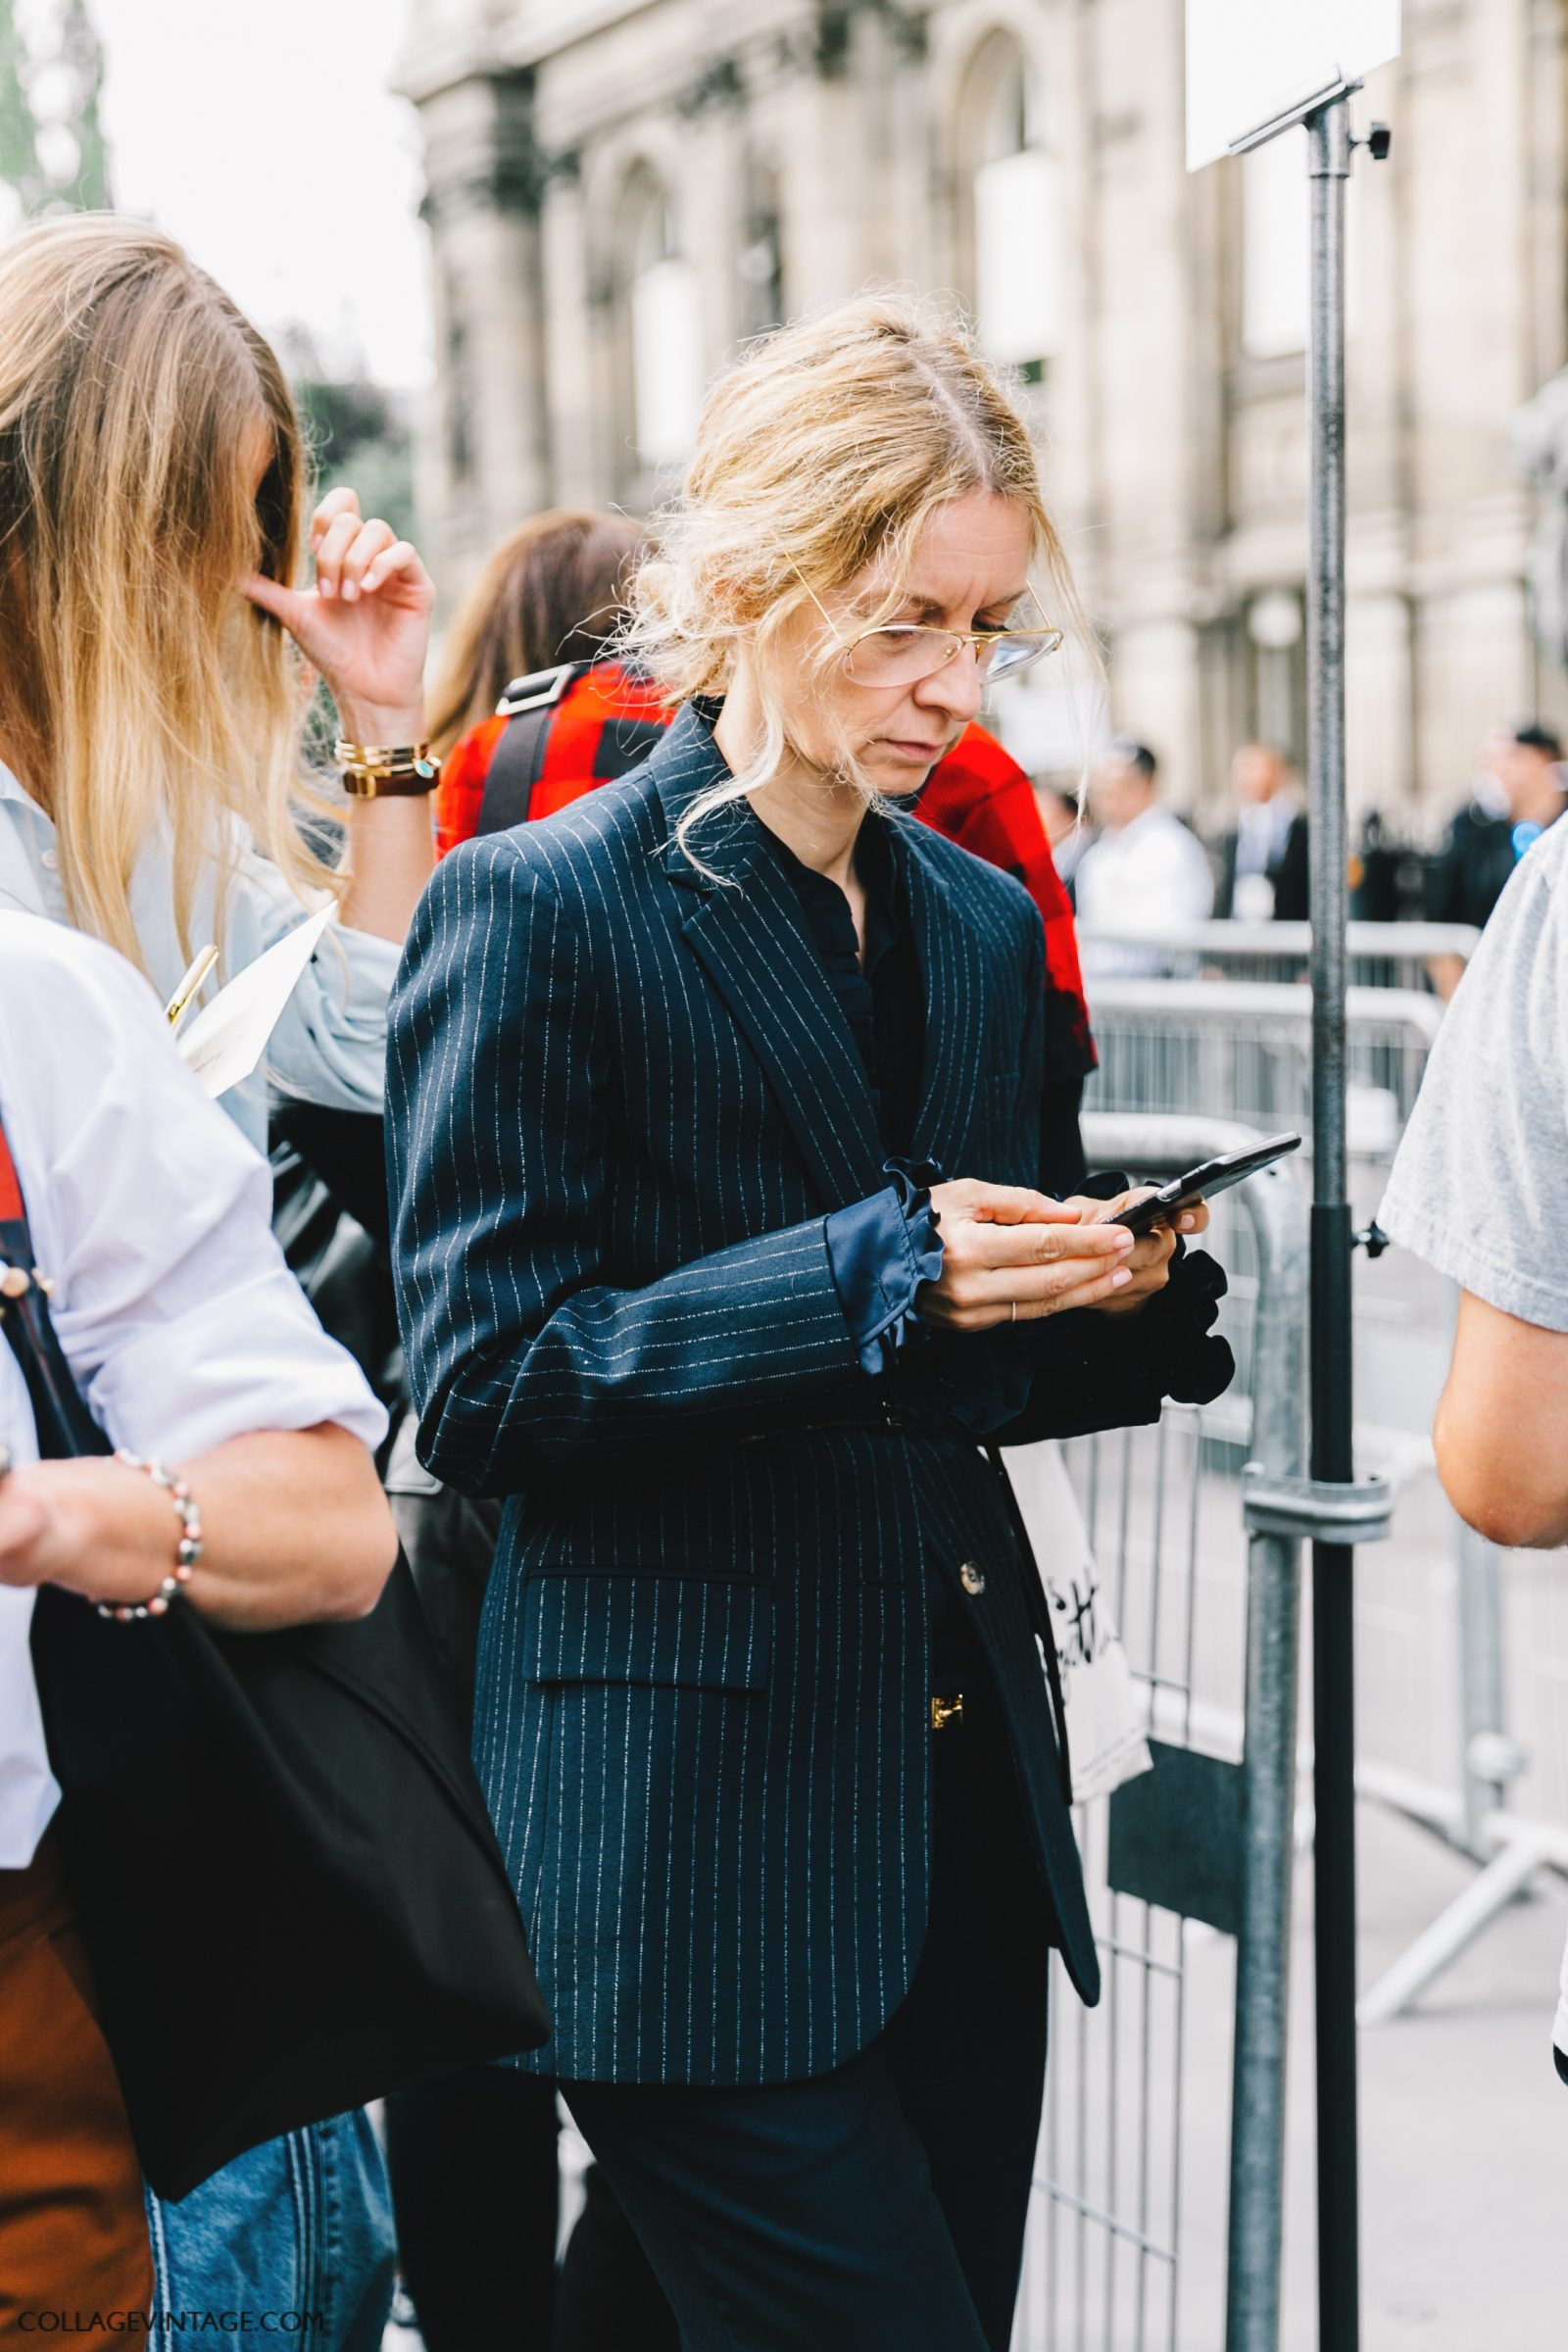 pfw-paris_fashion_week_ss17-street_style-outfits-collage_vintage-rochas-courreges-dries_van_noten-lanvin-guy_laroche-87